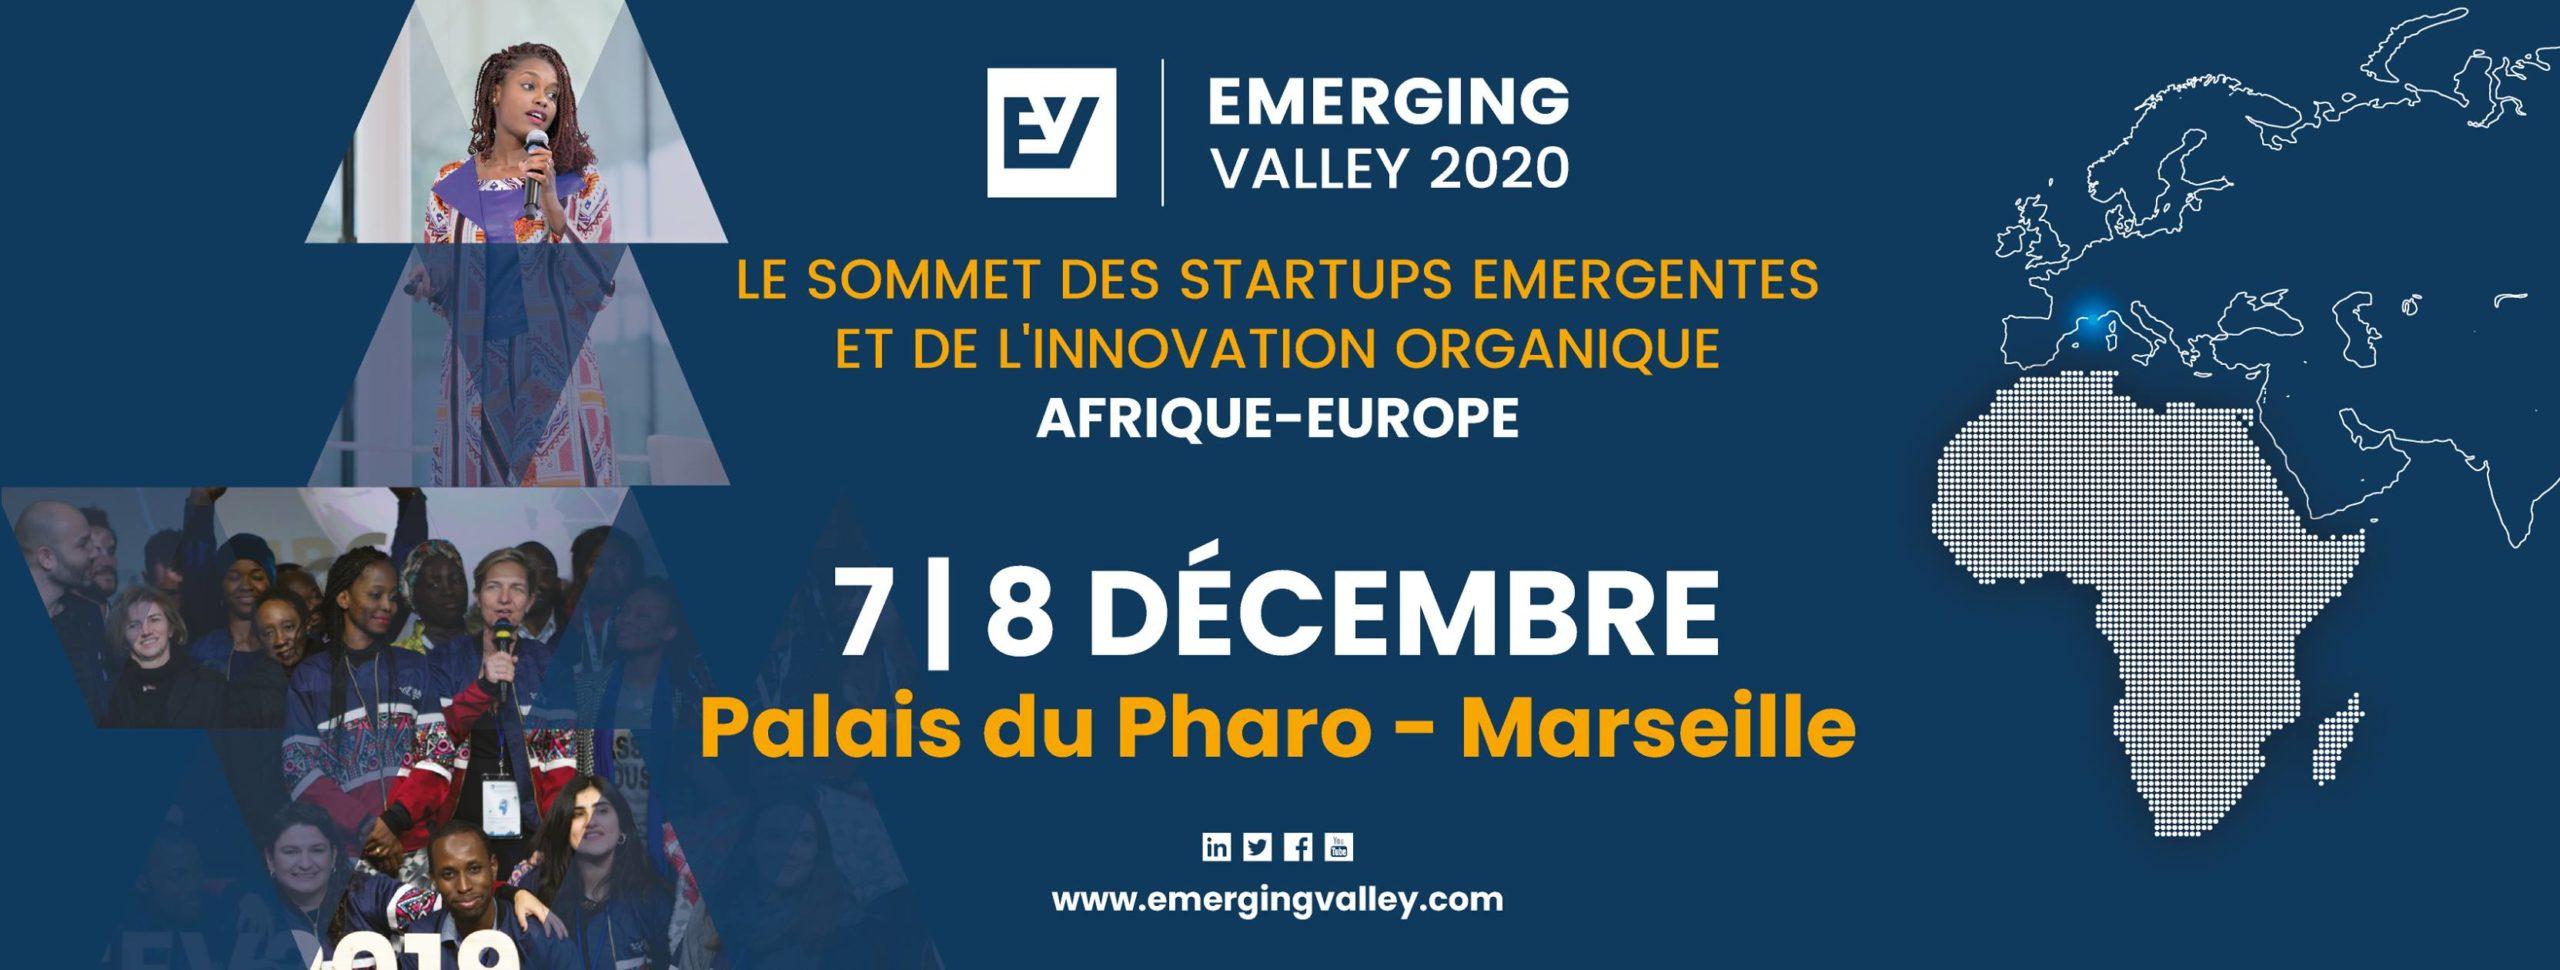 Emerging valley 2020